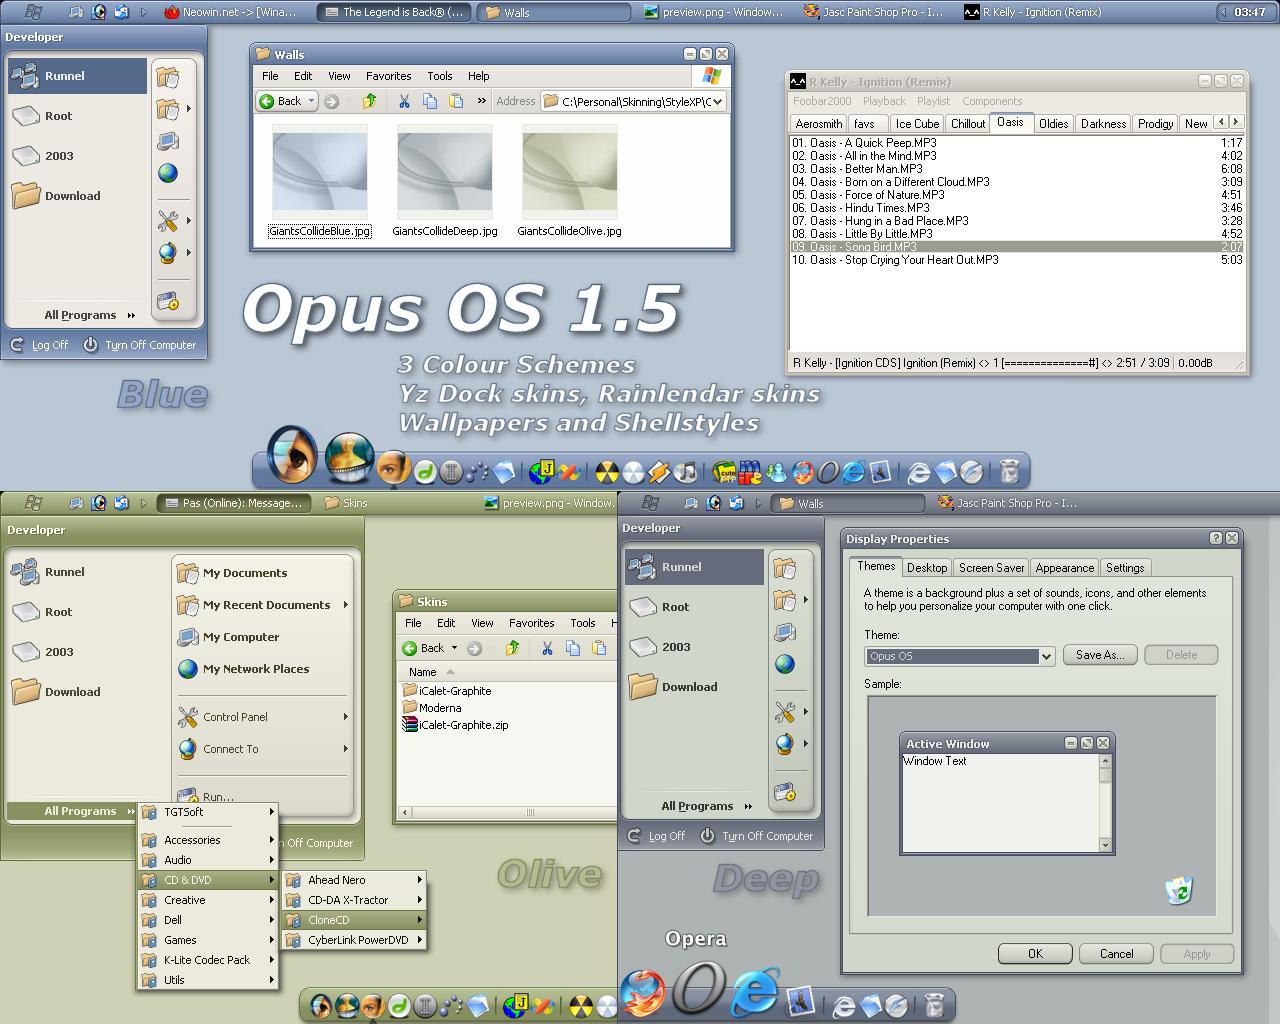 Opus OS 1.5